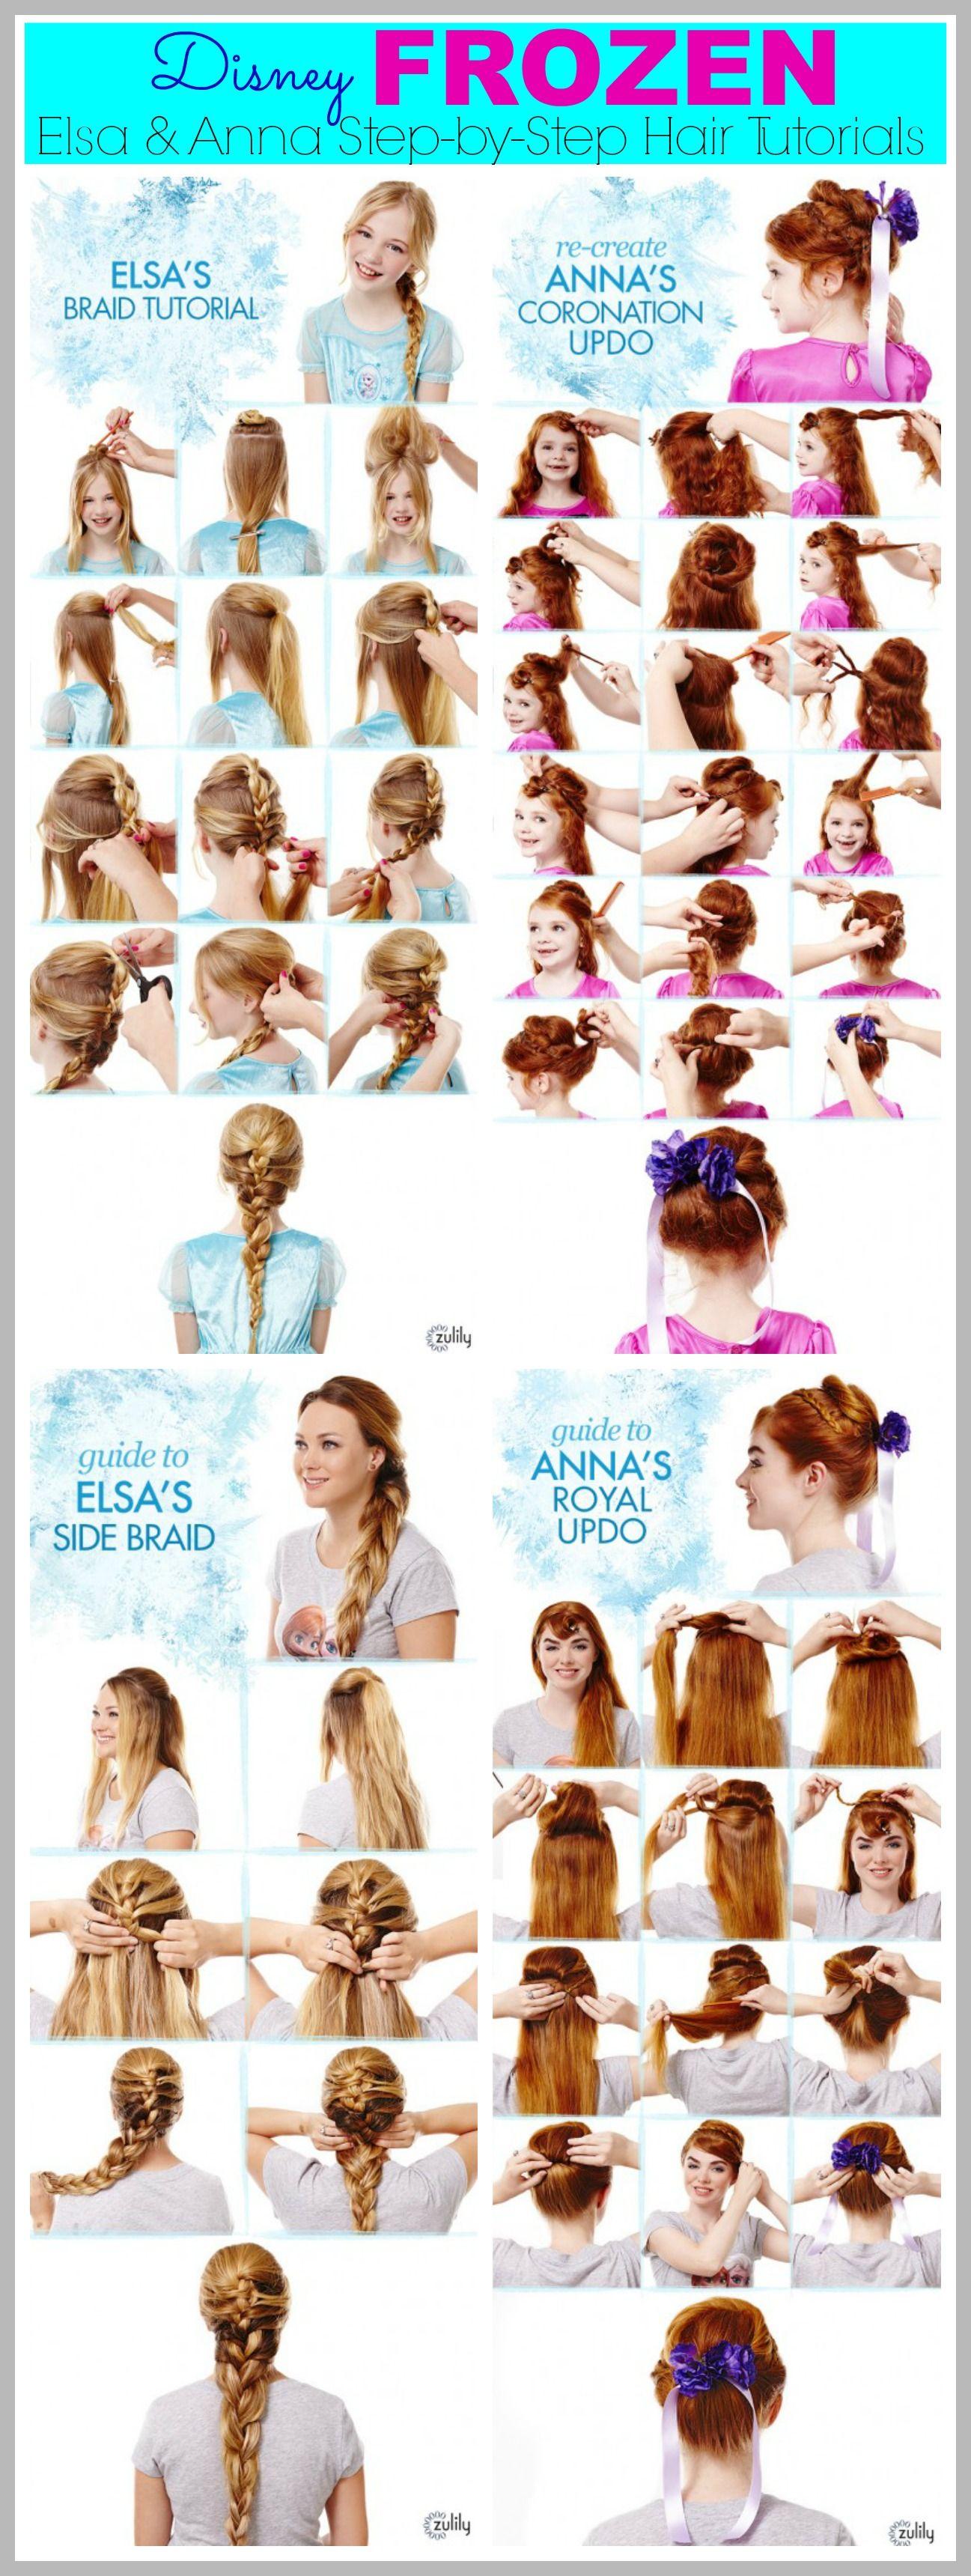 Frozen Hair Tutorials Elsa And Anna Hacks Frozen Hair Tutorial Frozen Hair Anna Hair